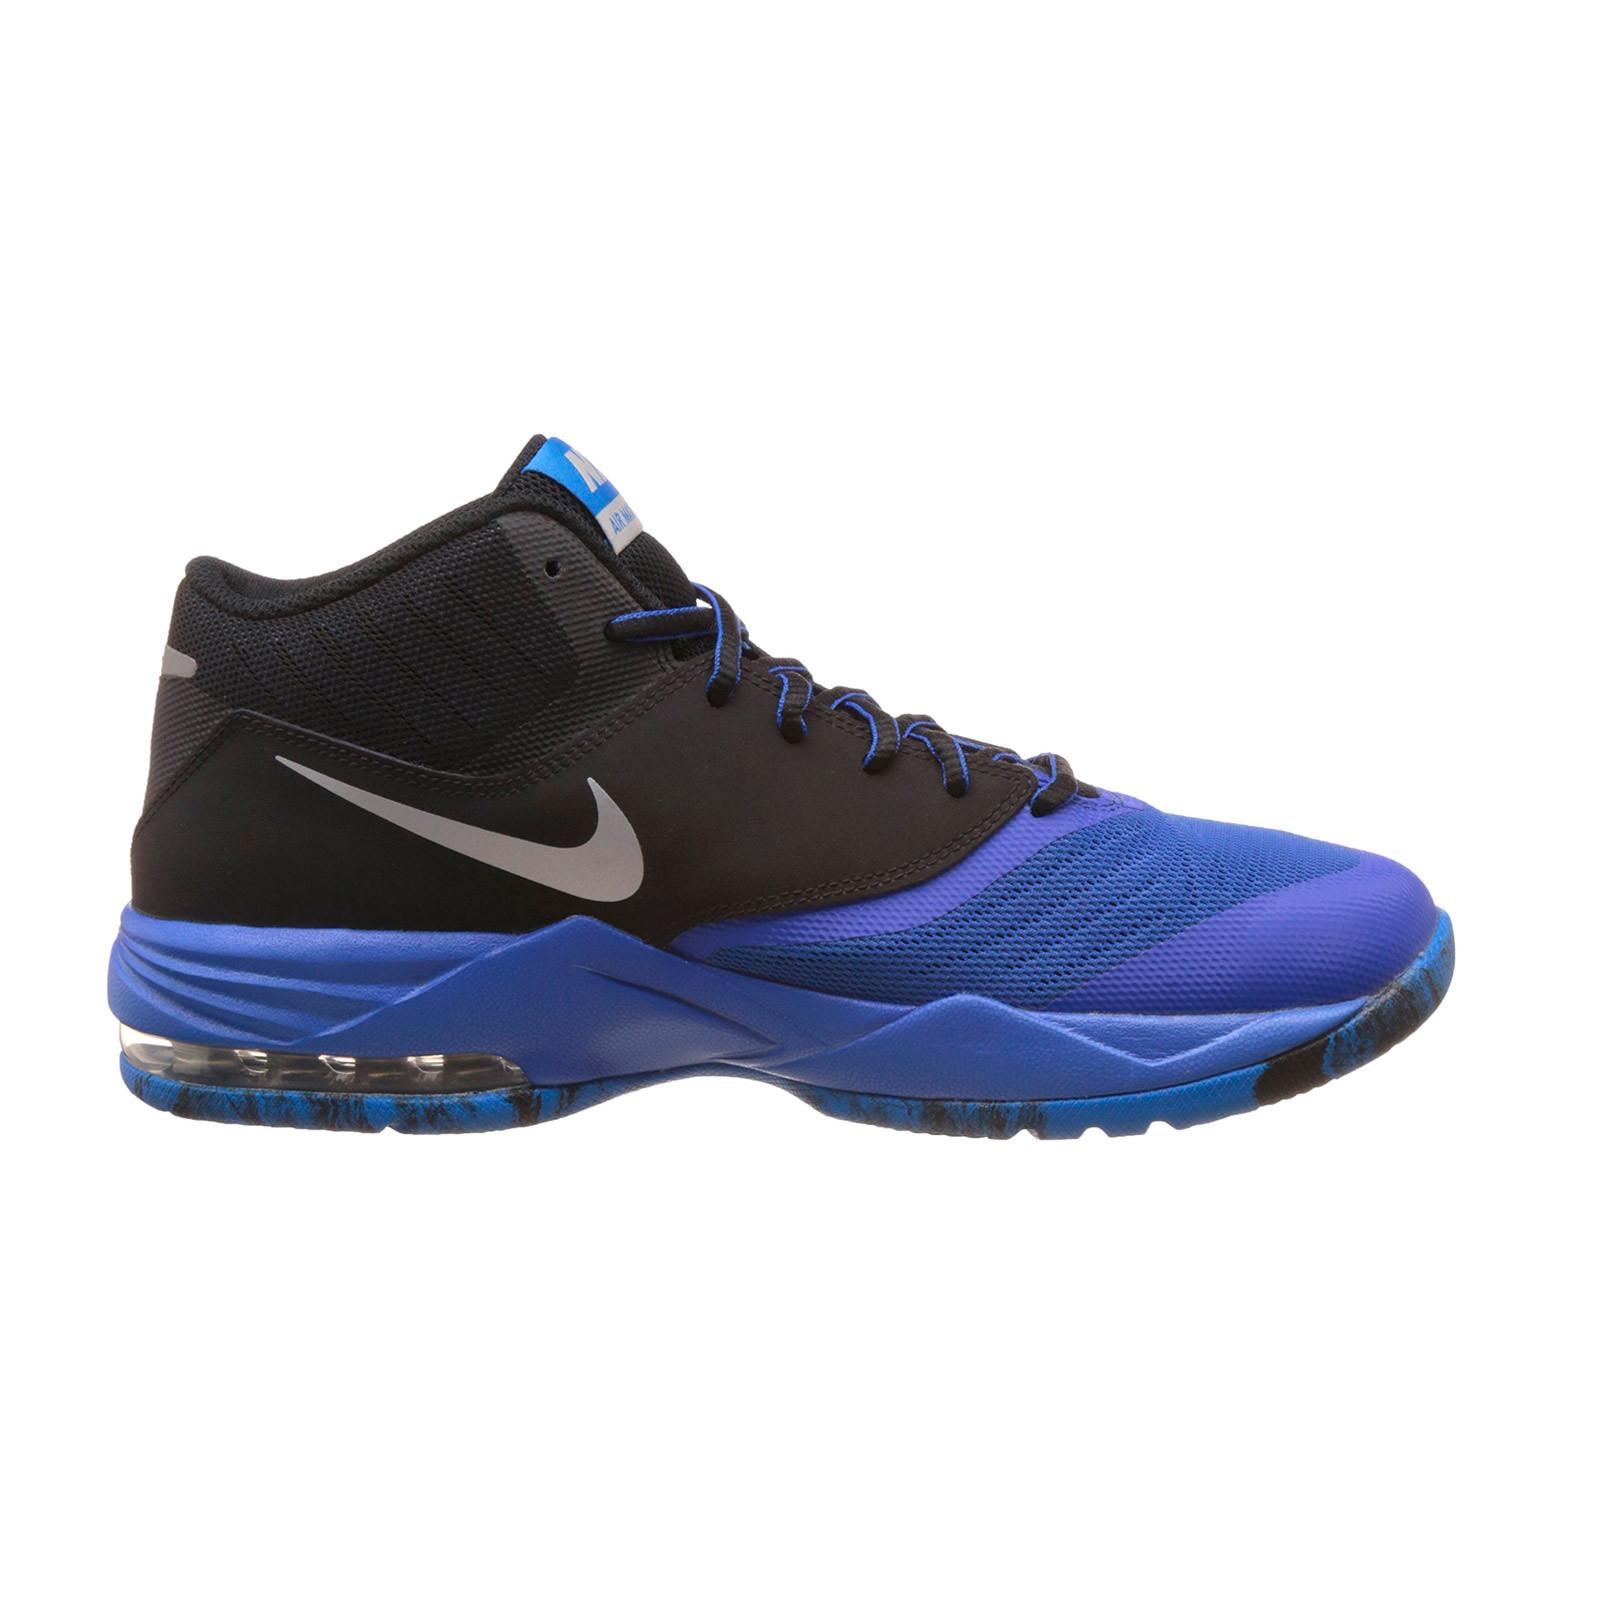 sátira Importancia longitud  Zapatillas Nike Air Max Emergent Basketball para Hombre   Runa Store